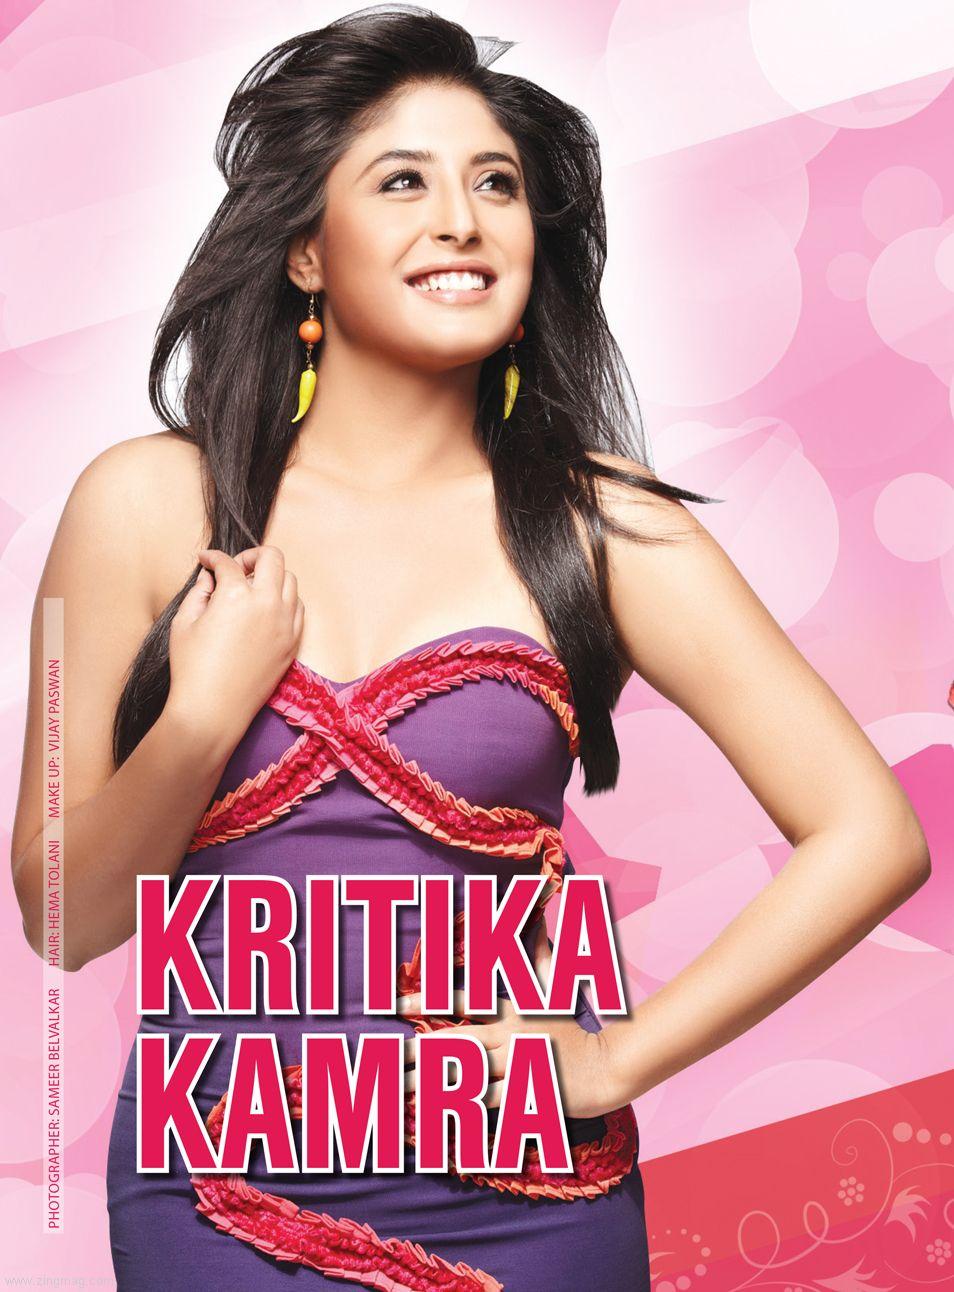 Kritika Kamra Cover Story of Zing Magazine February 2013